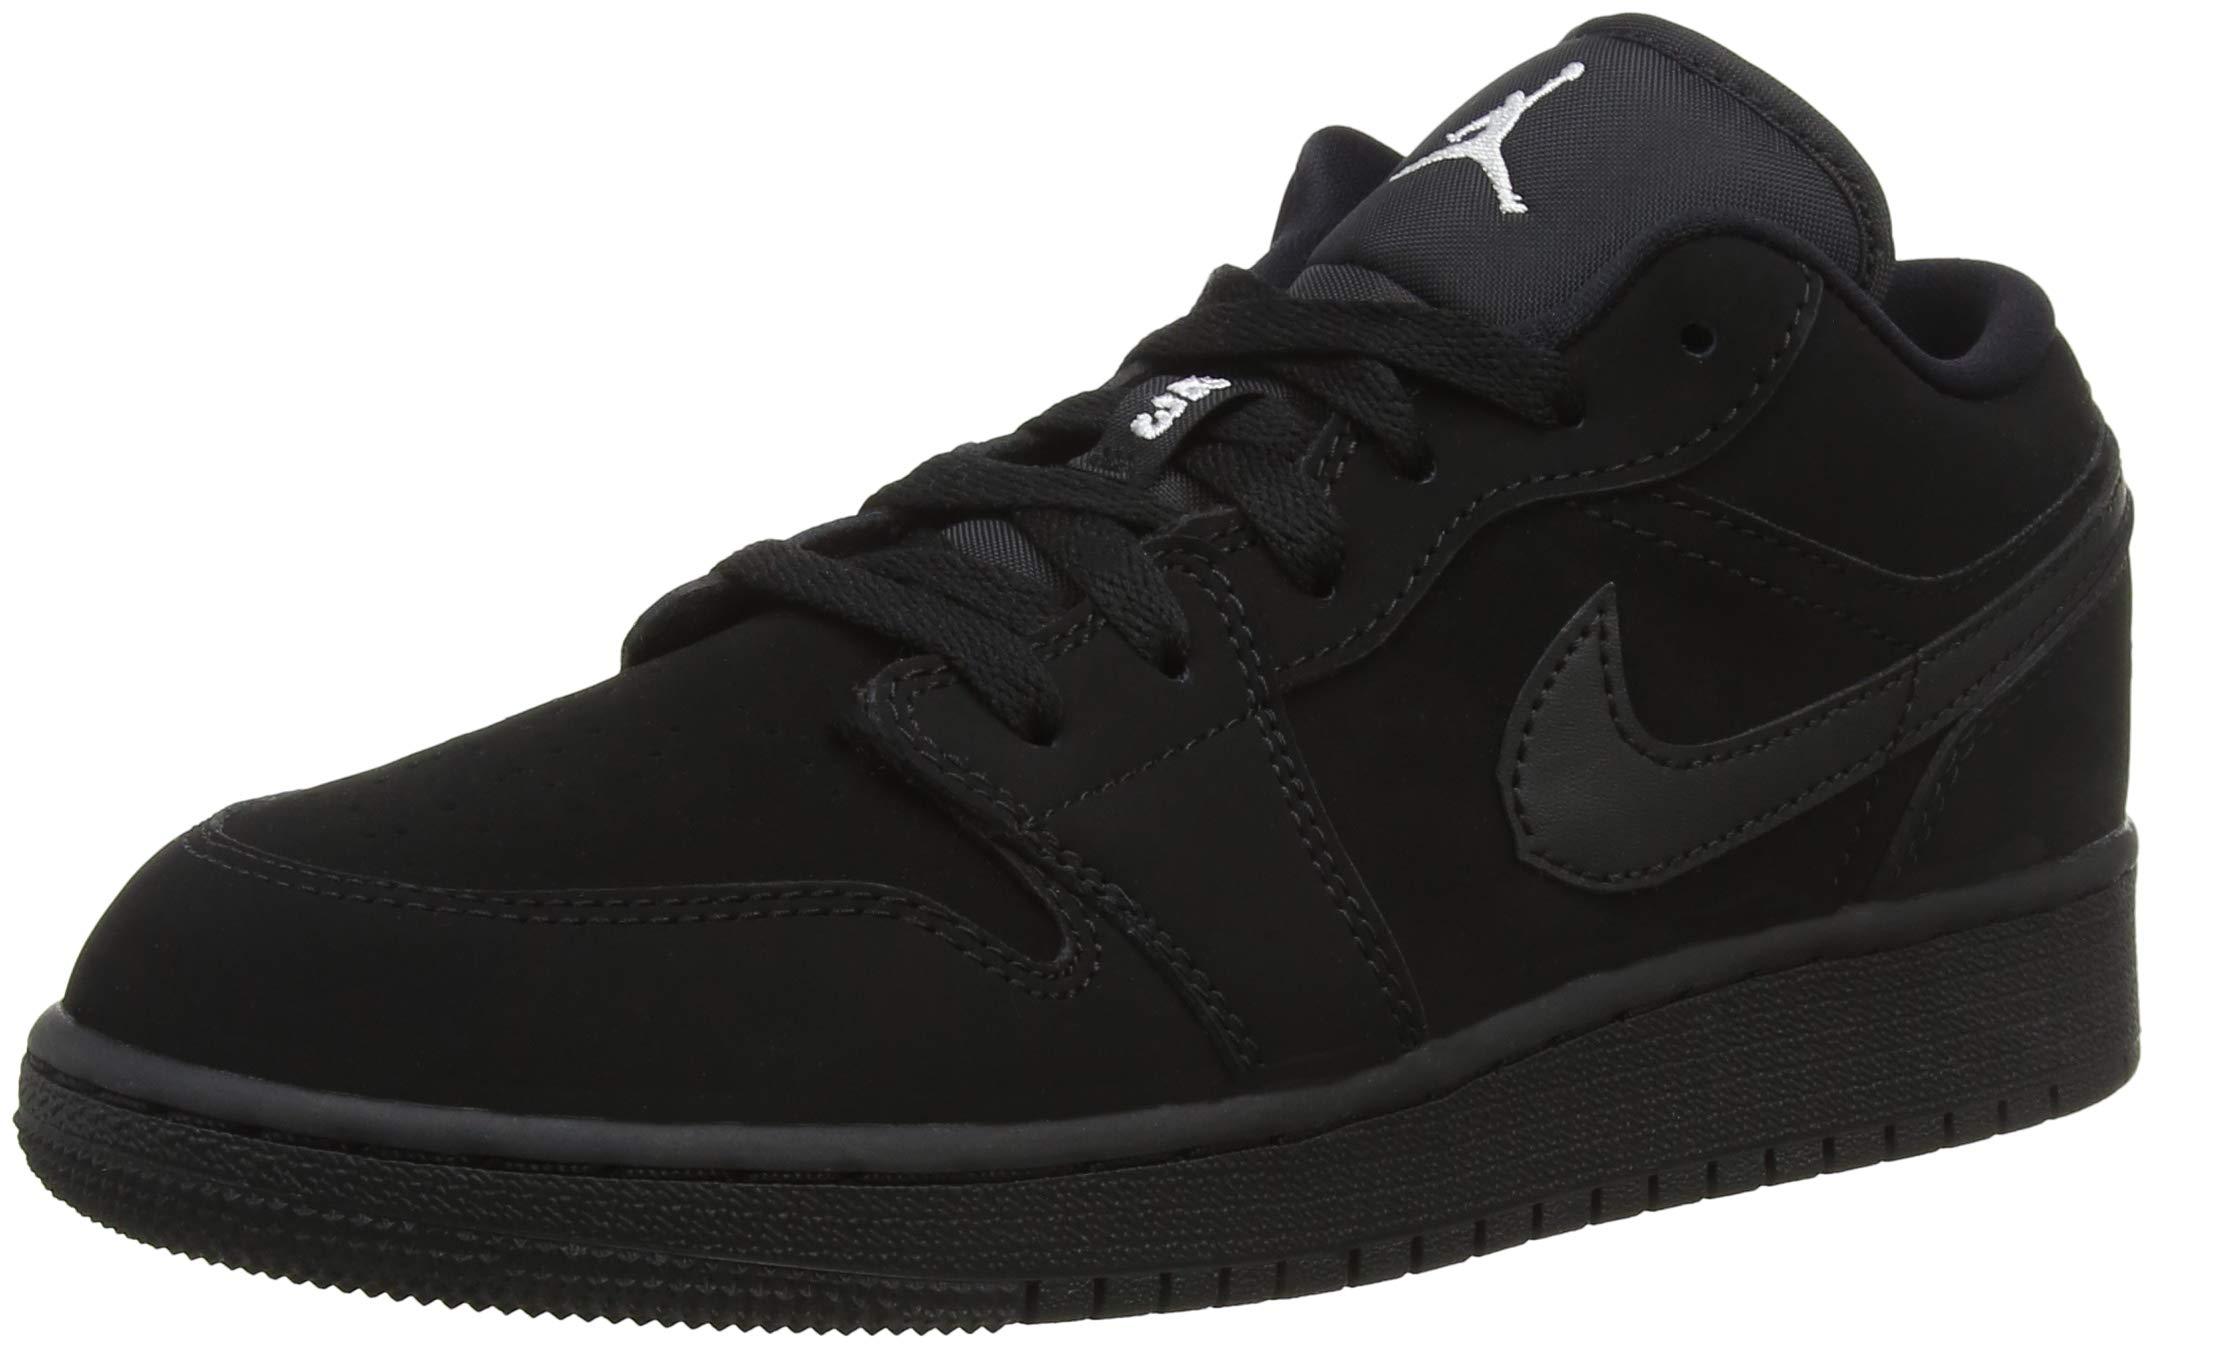 Jordan Air 1 Low (Kids) Black/White